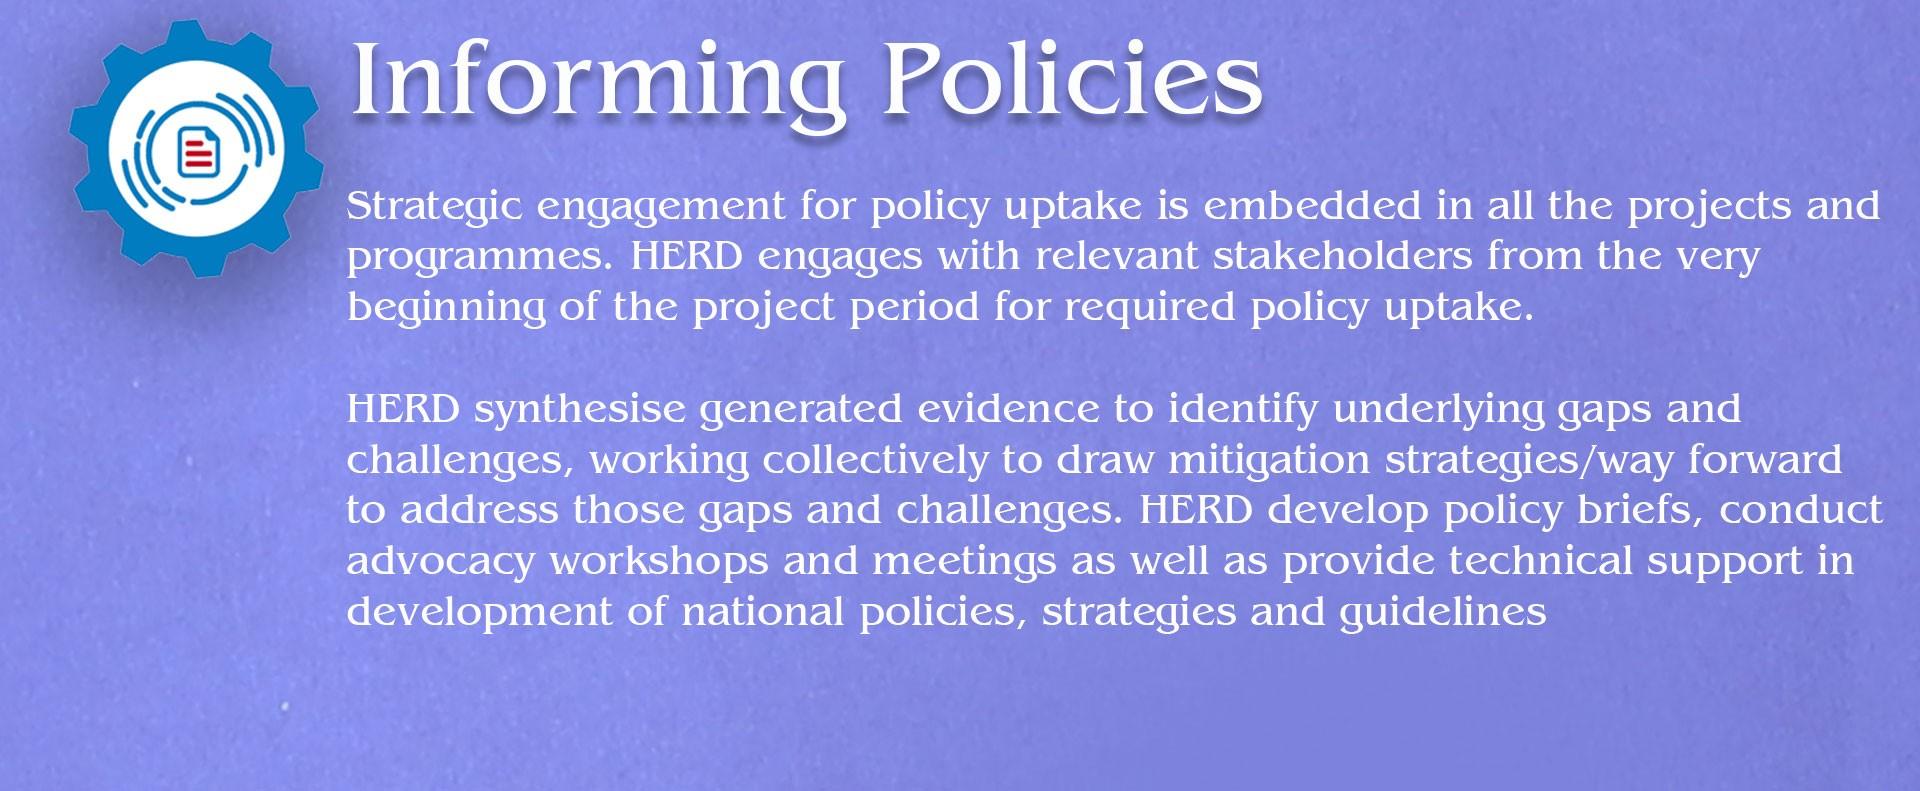 Informing Policies